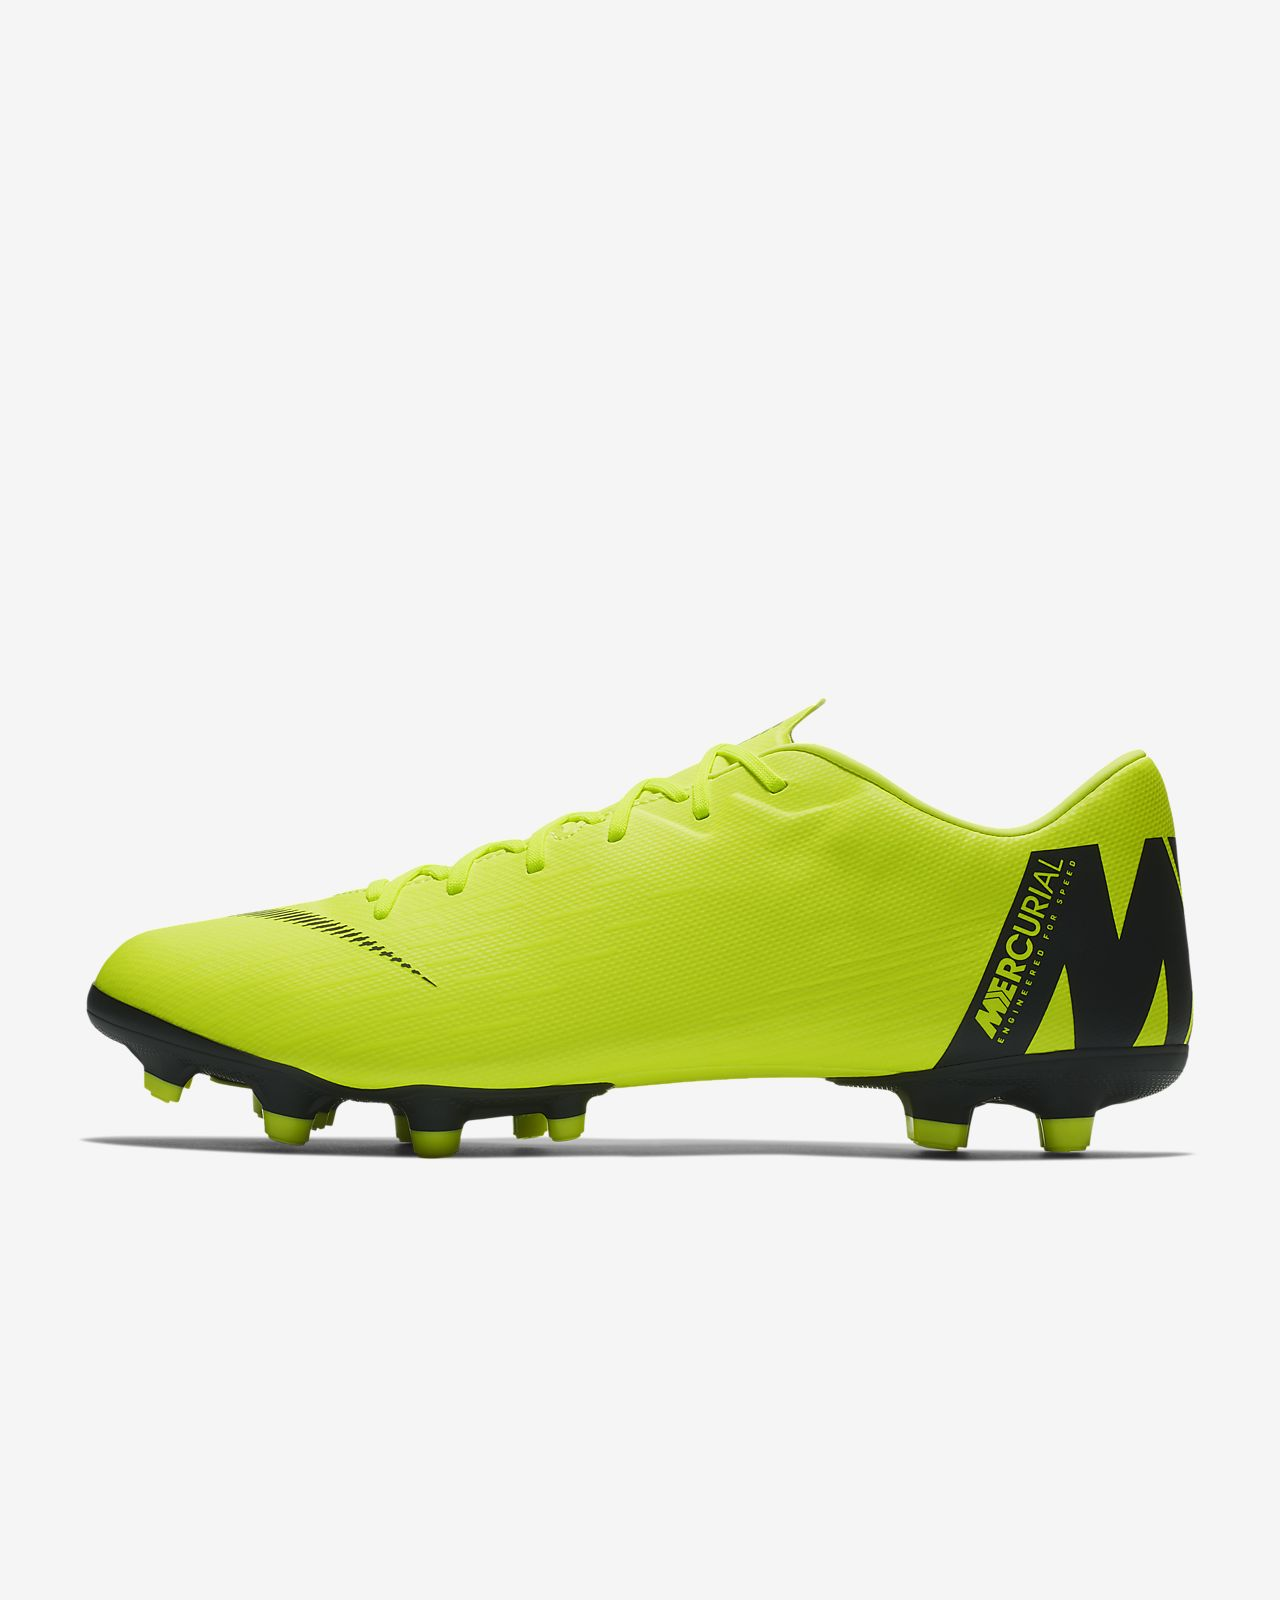 online retailer 903ac ea845 Chaussure de football multi-terrains à crampons Nike Vapor 12 Academy MG